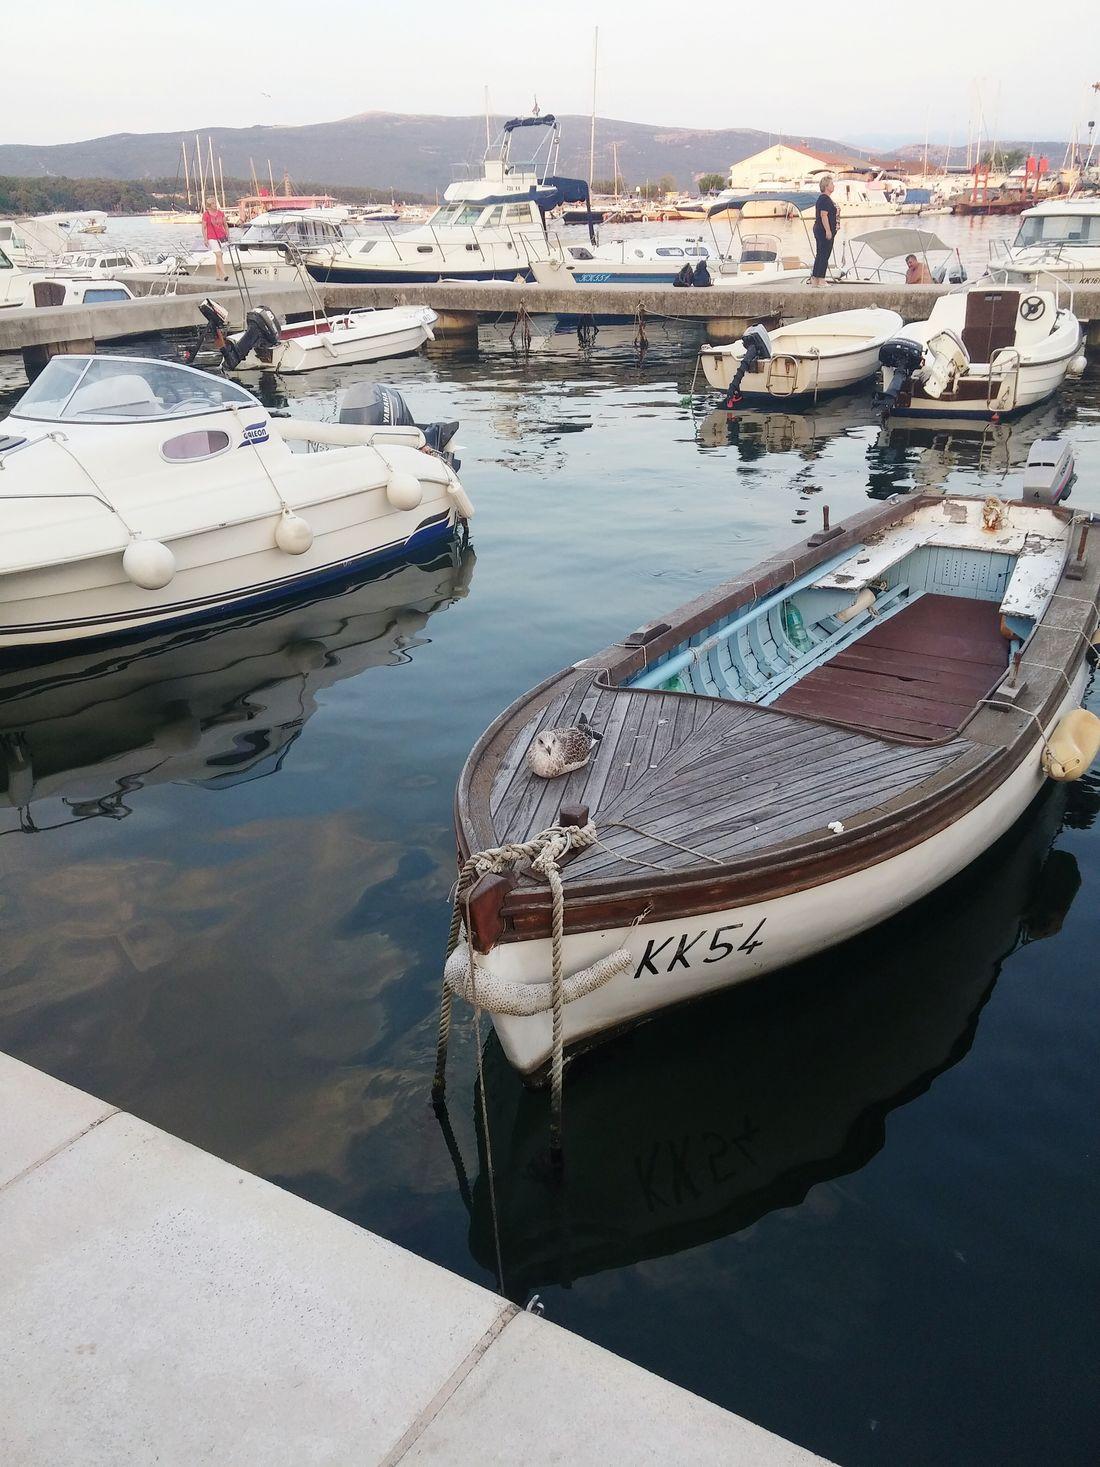 Island Krk Adriatic Sea Relaxing Enjoying Life